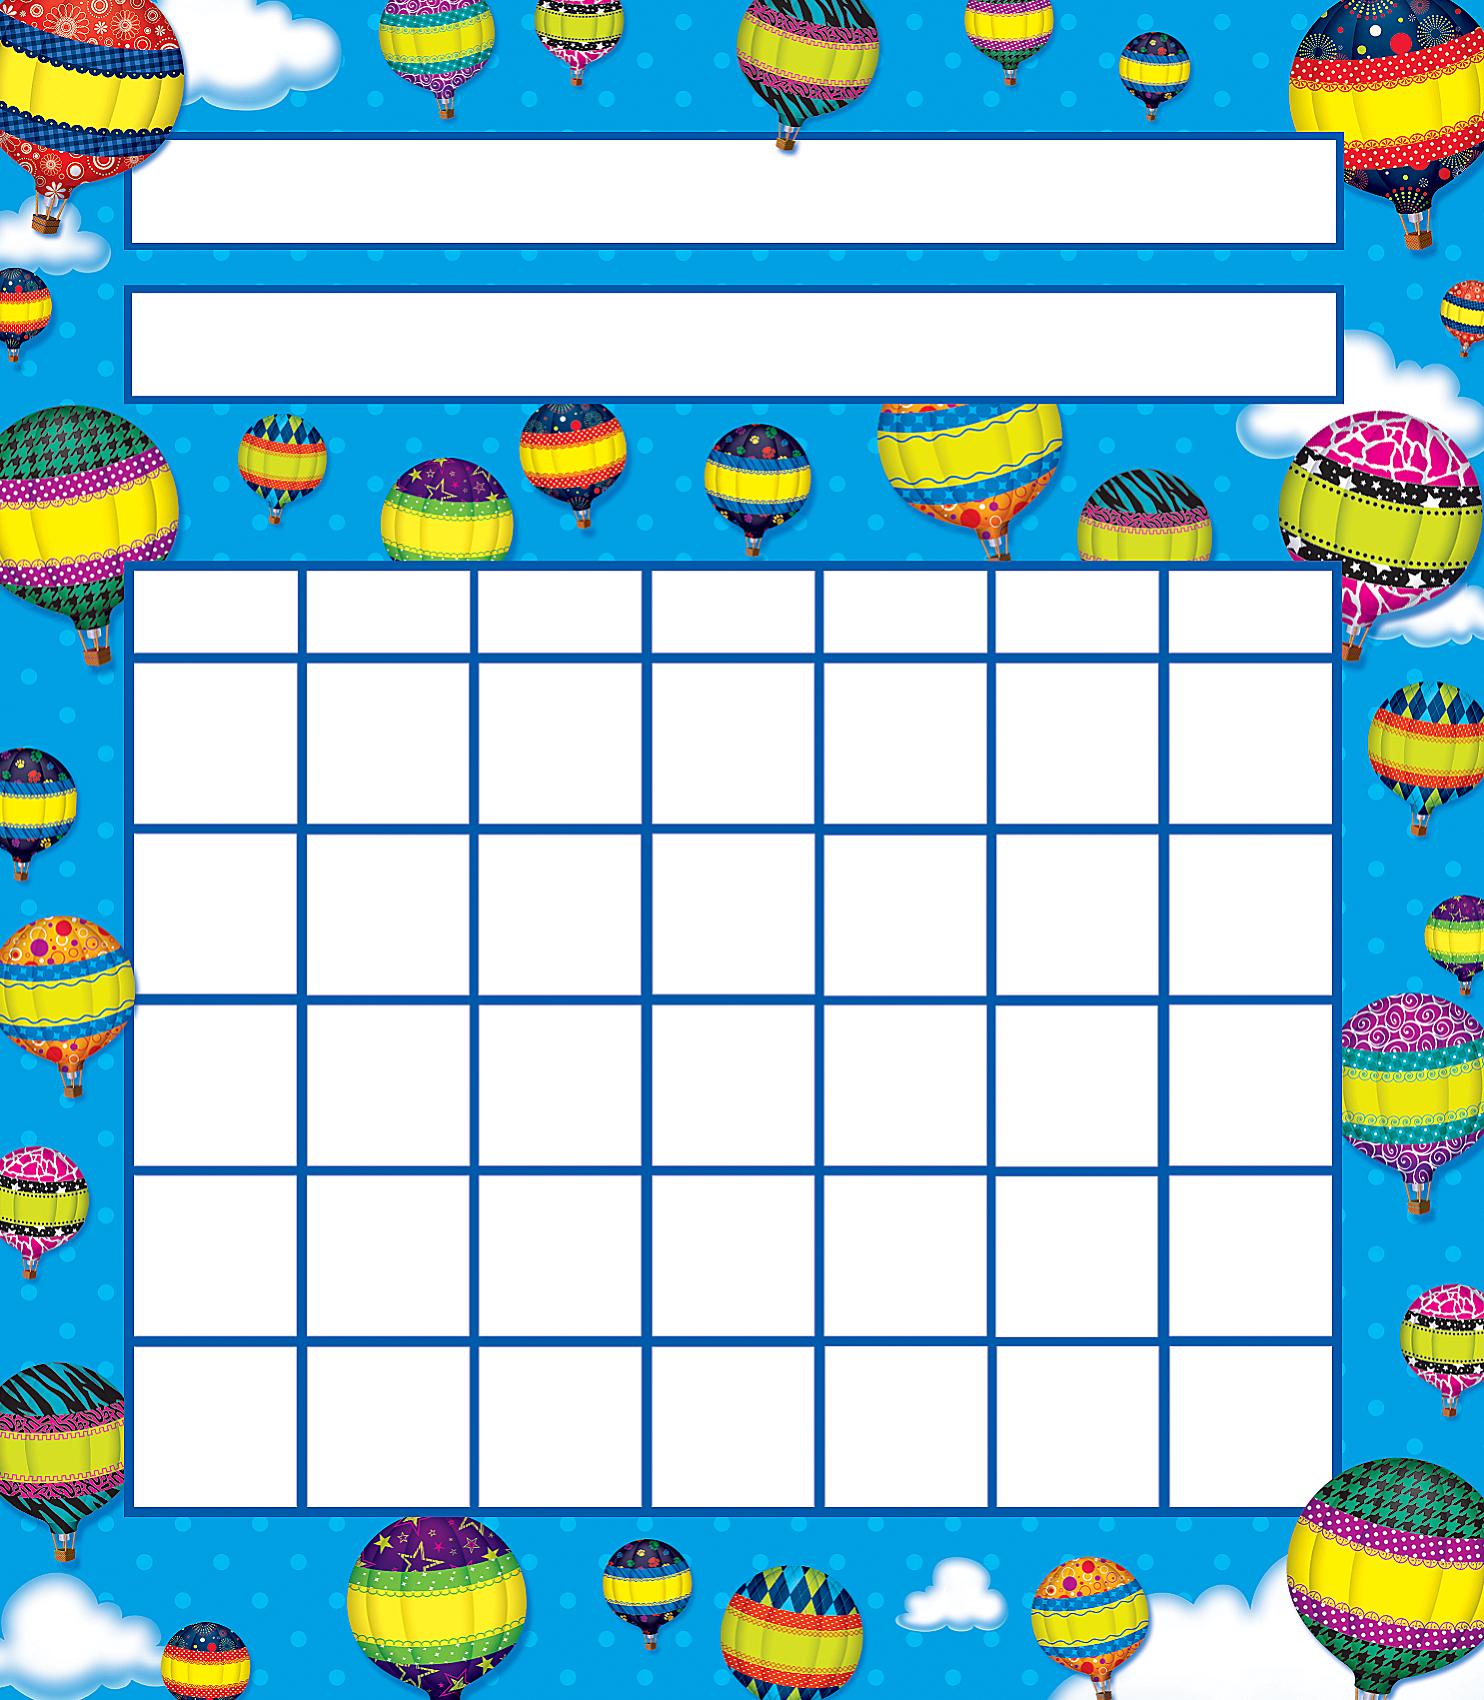 sticker reward chart baloon